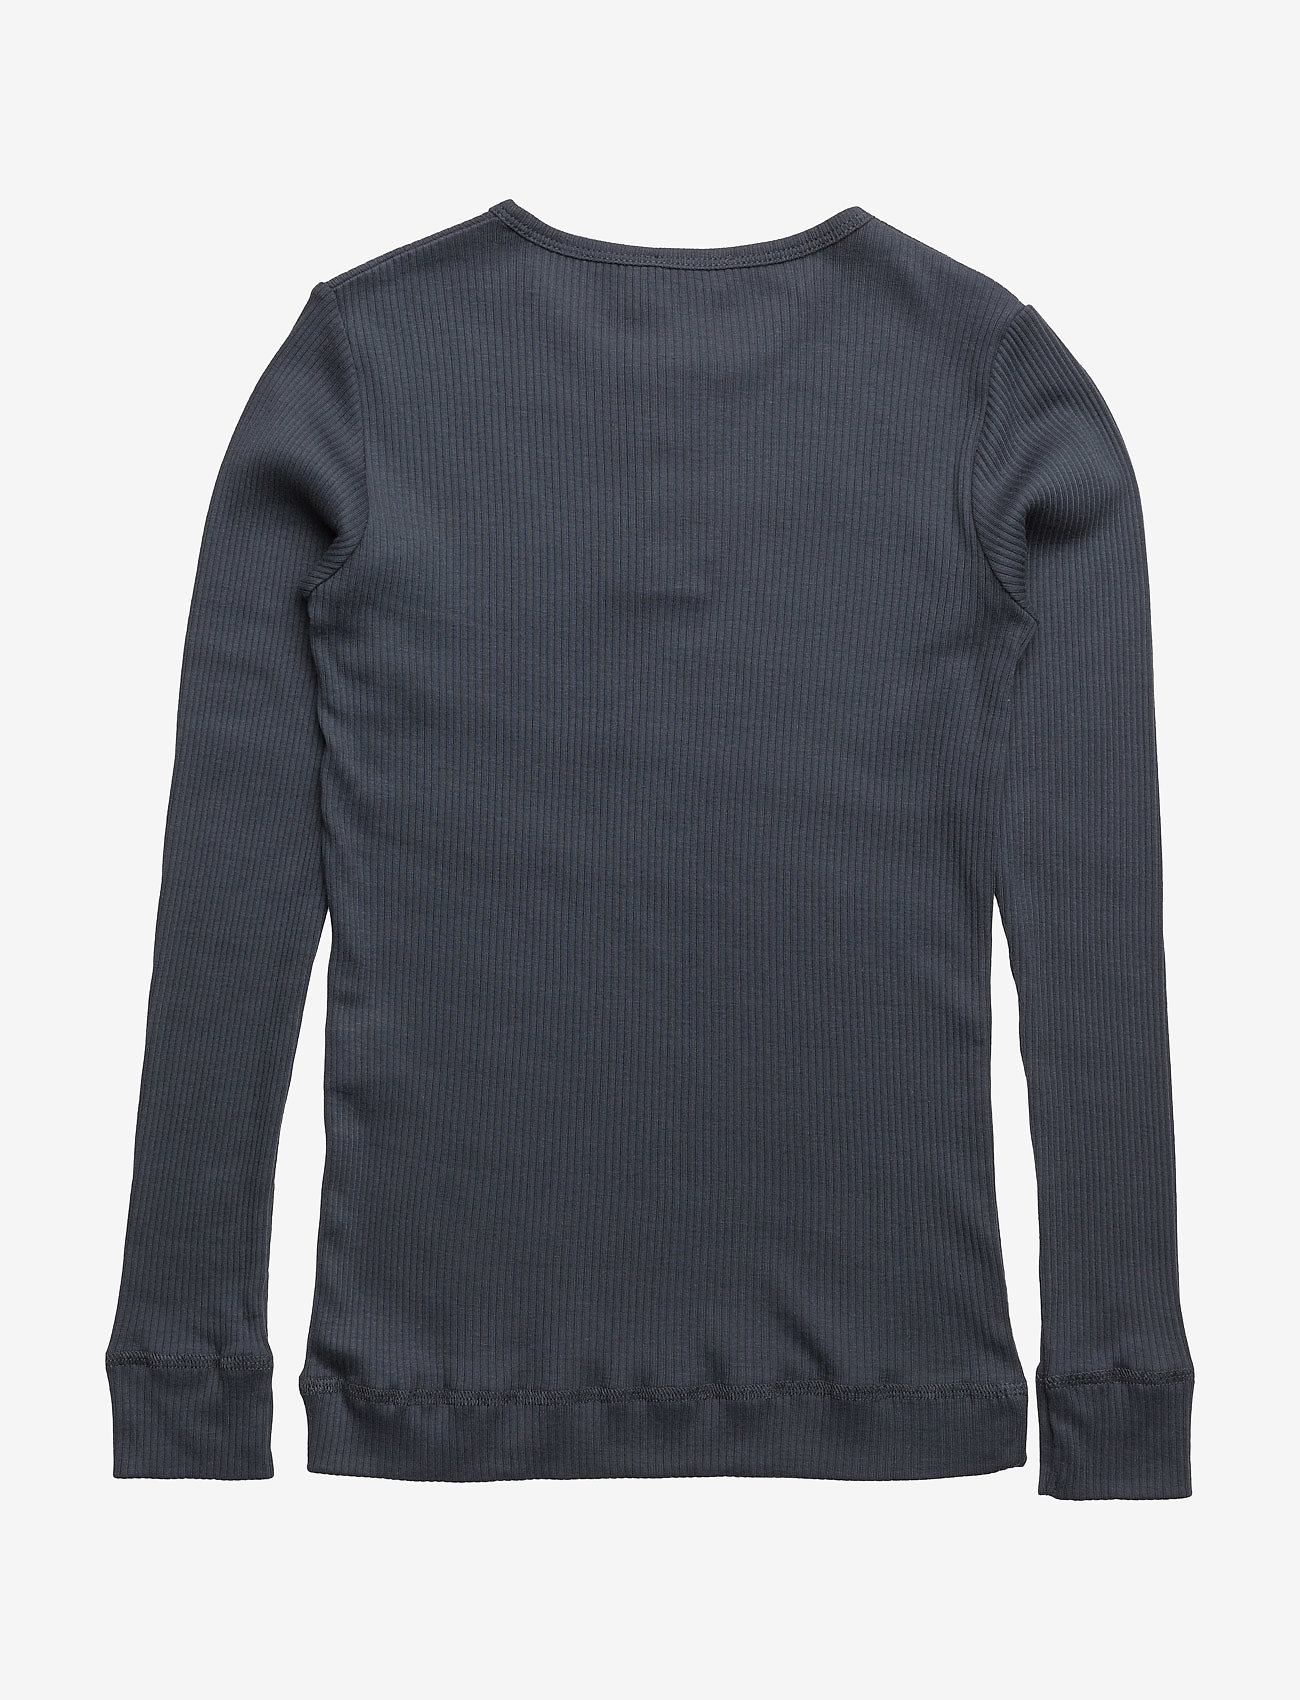 MarMar Cph - Tee LS - pitkähihaiset paidat - blue - 1